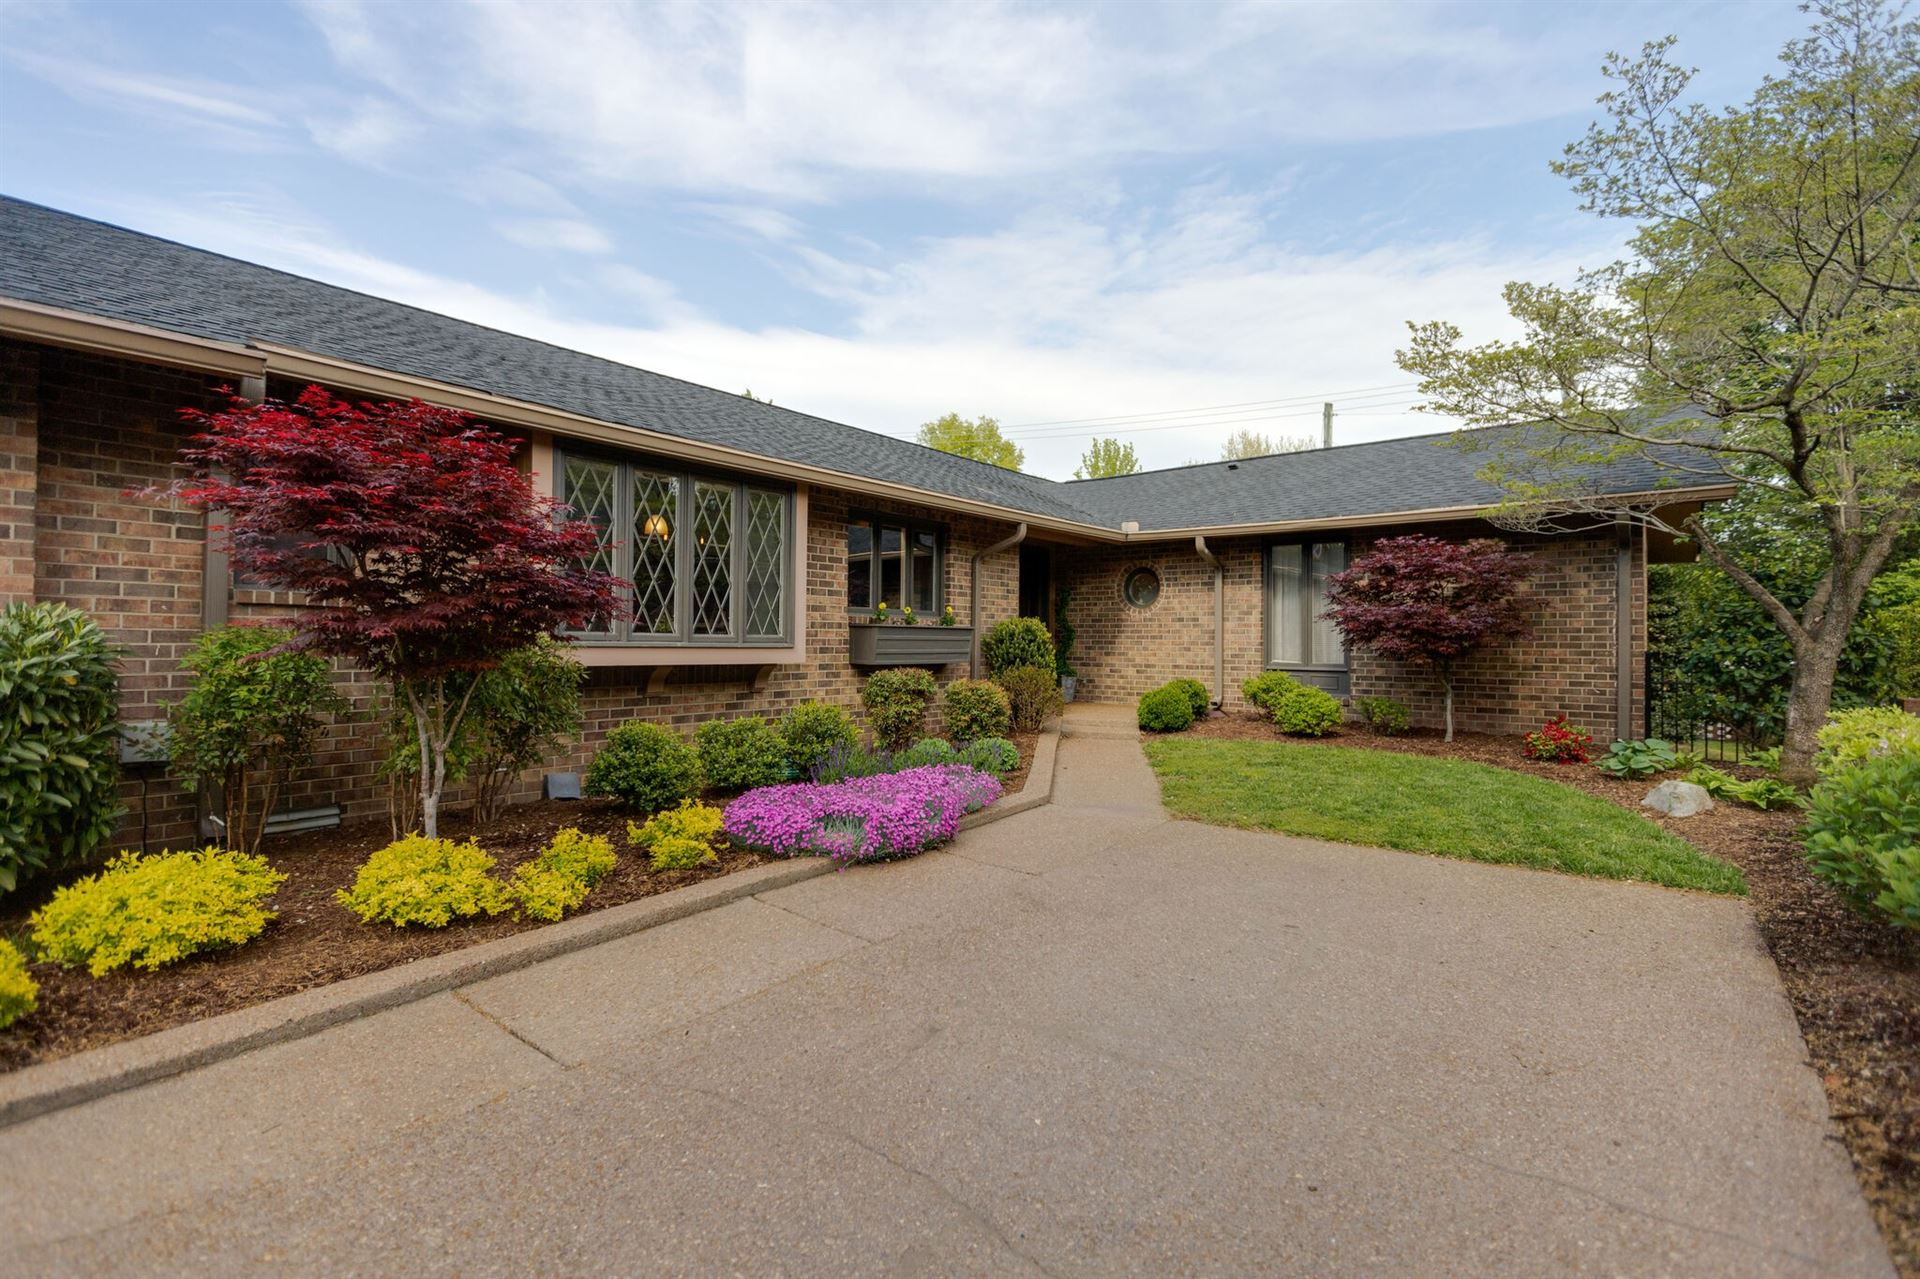 6002 Landmark Pl, Brentwood, TN 37027 - MLS#: 2253465